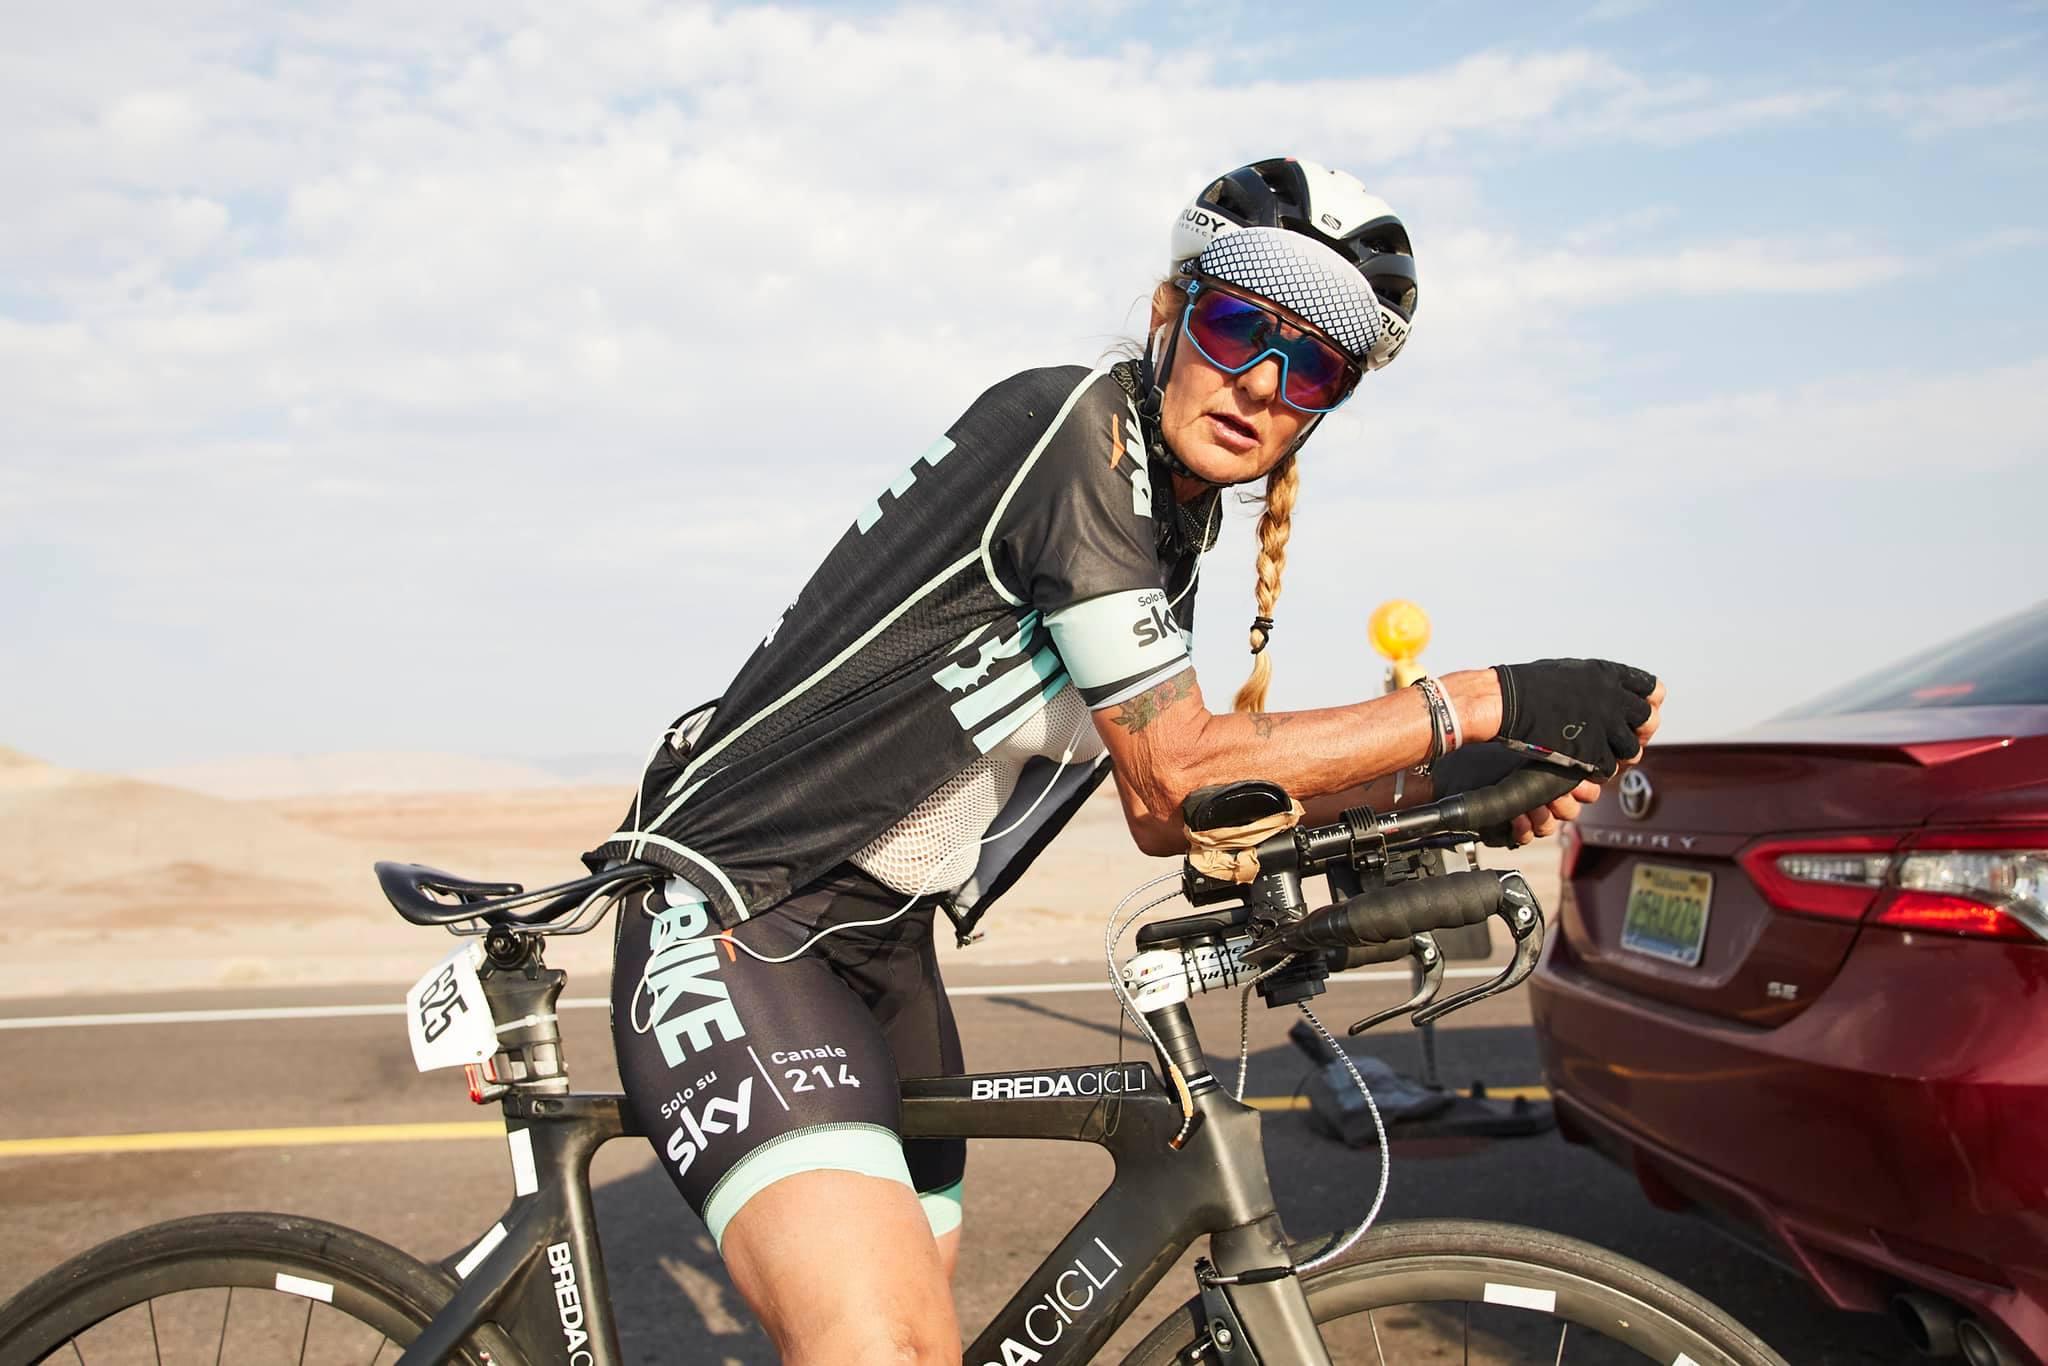 breda-cicli-dorina-vaccaroni-1-race-across-america